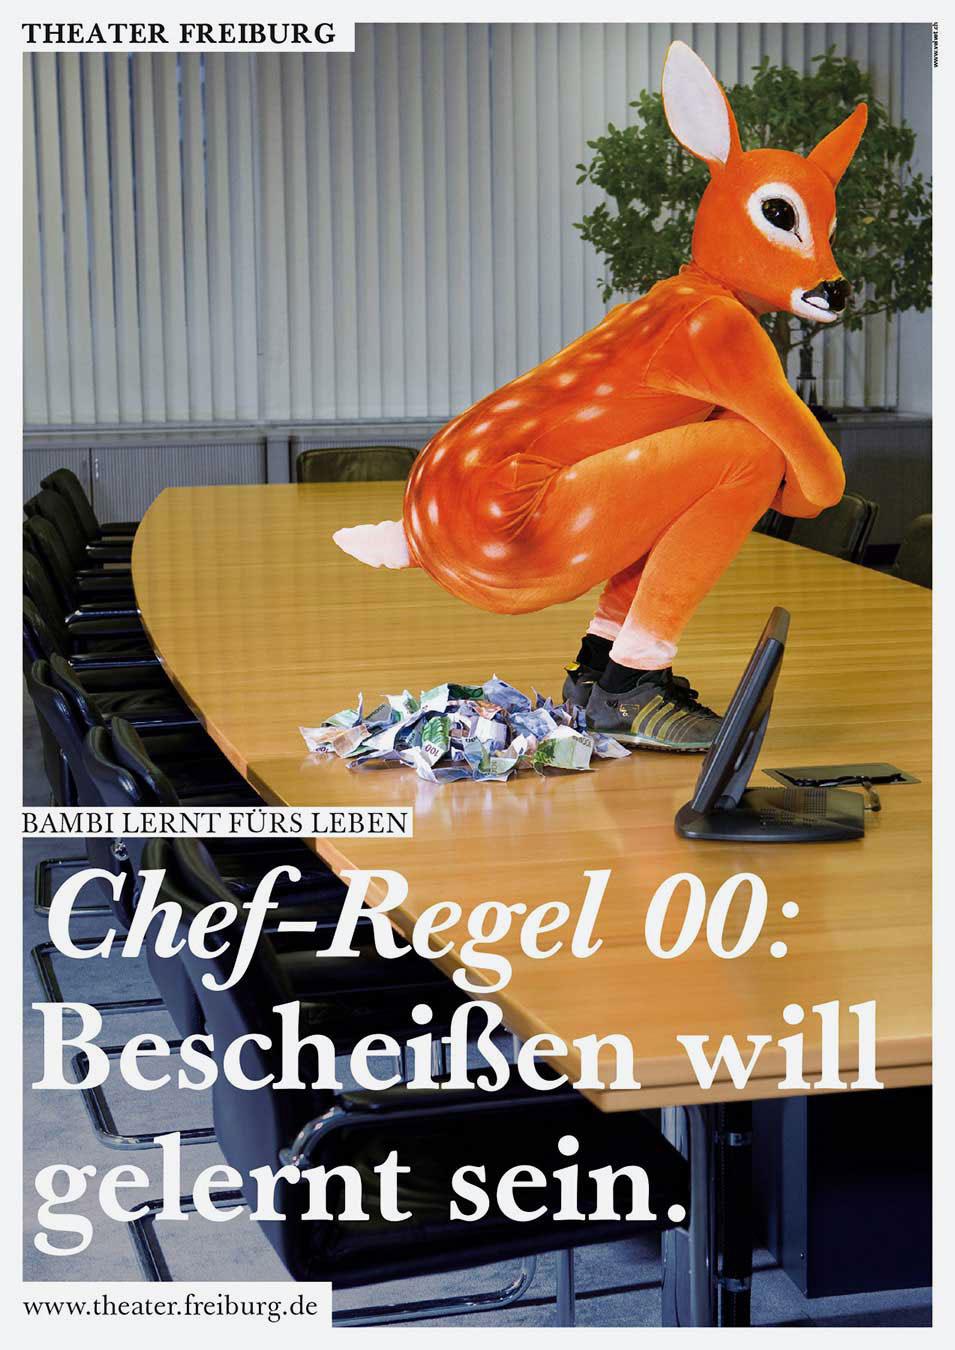 Theater Freiburg Bambi macht Theater Keyvisual Werbung